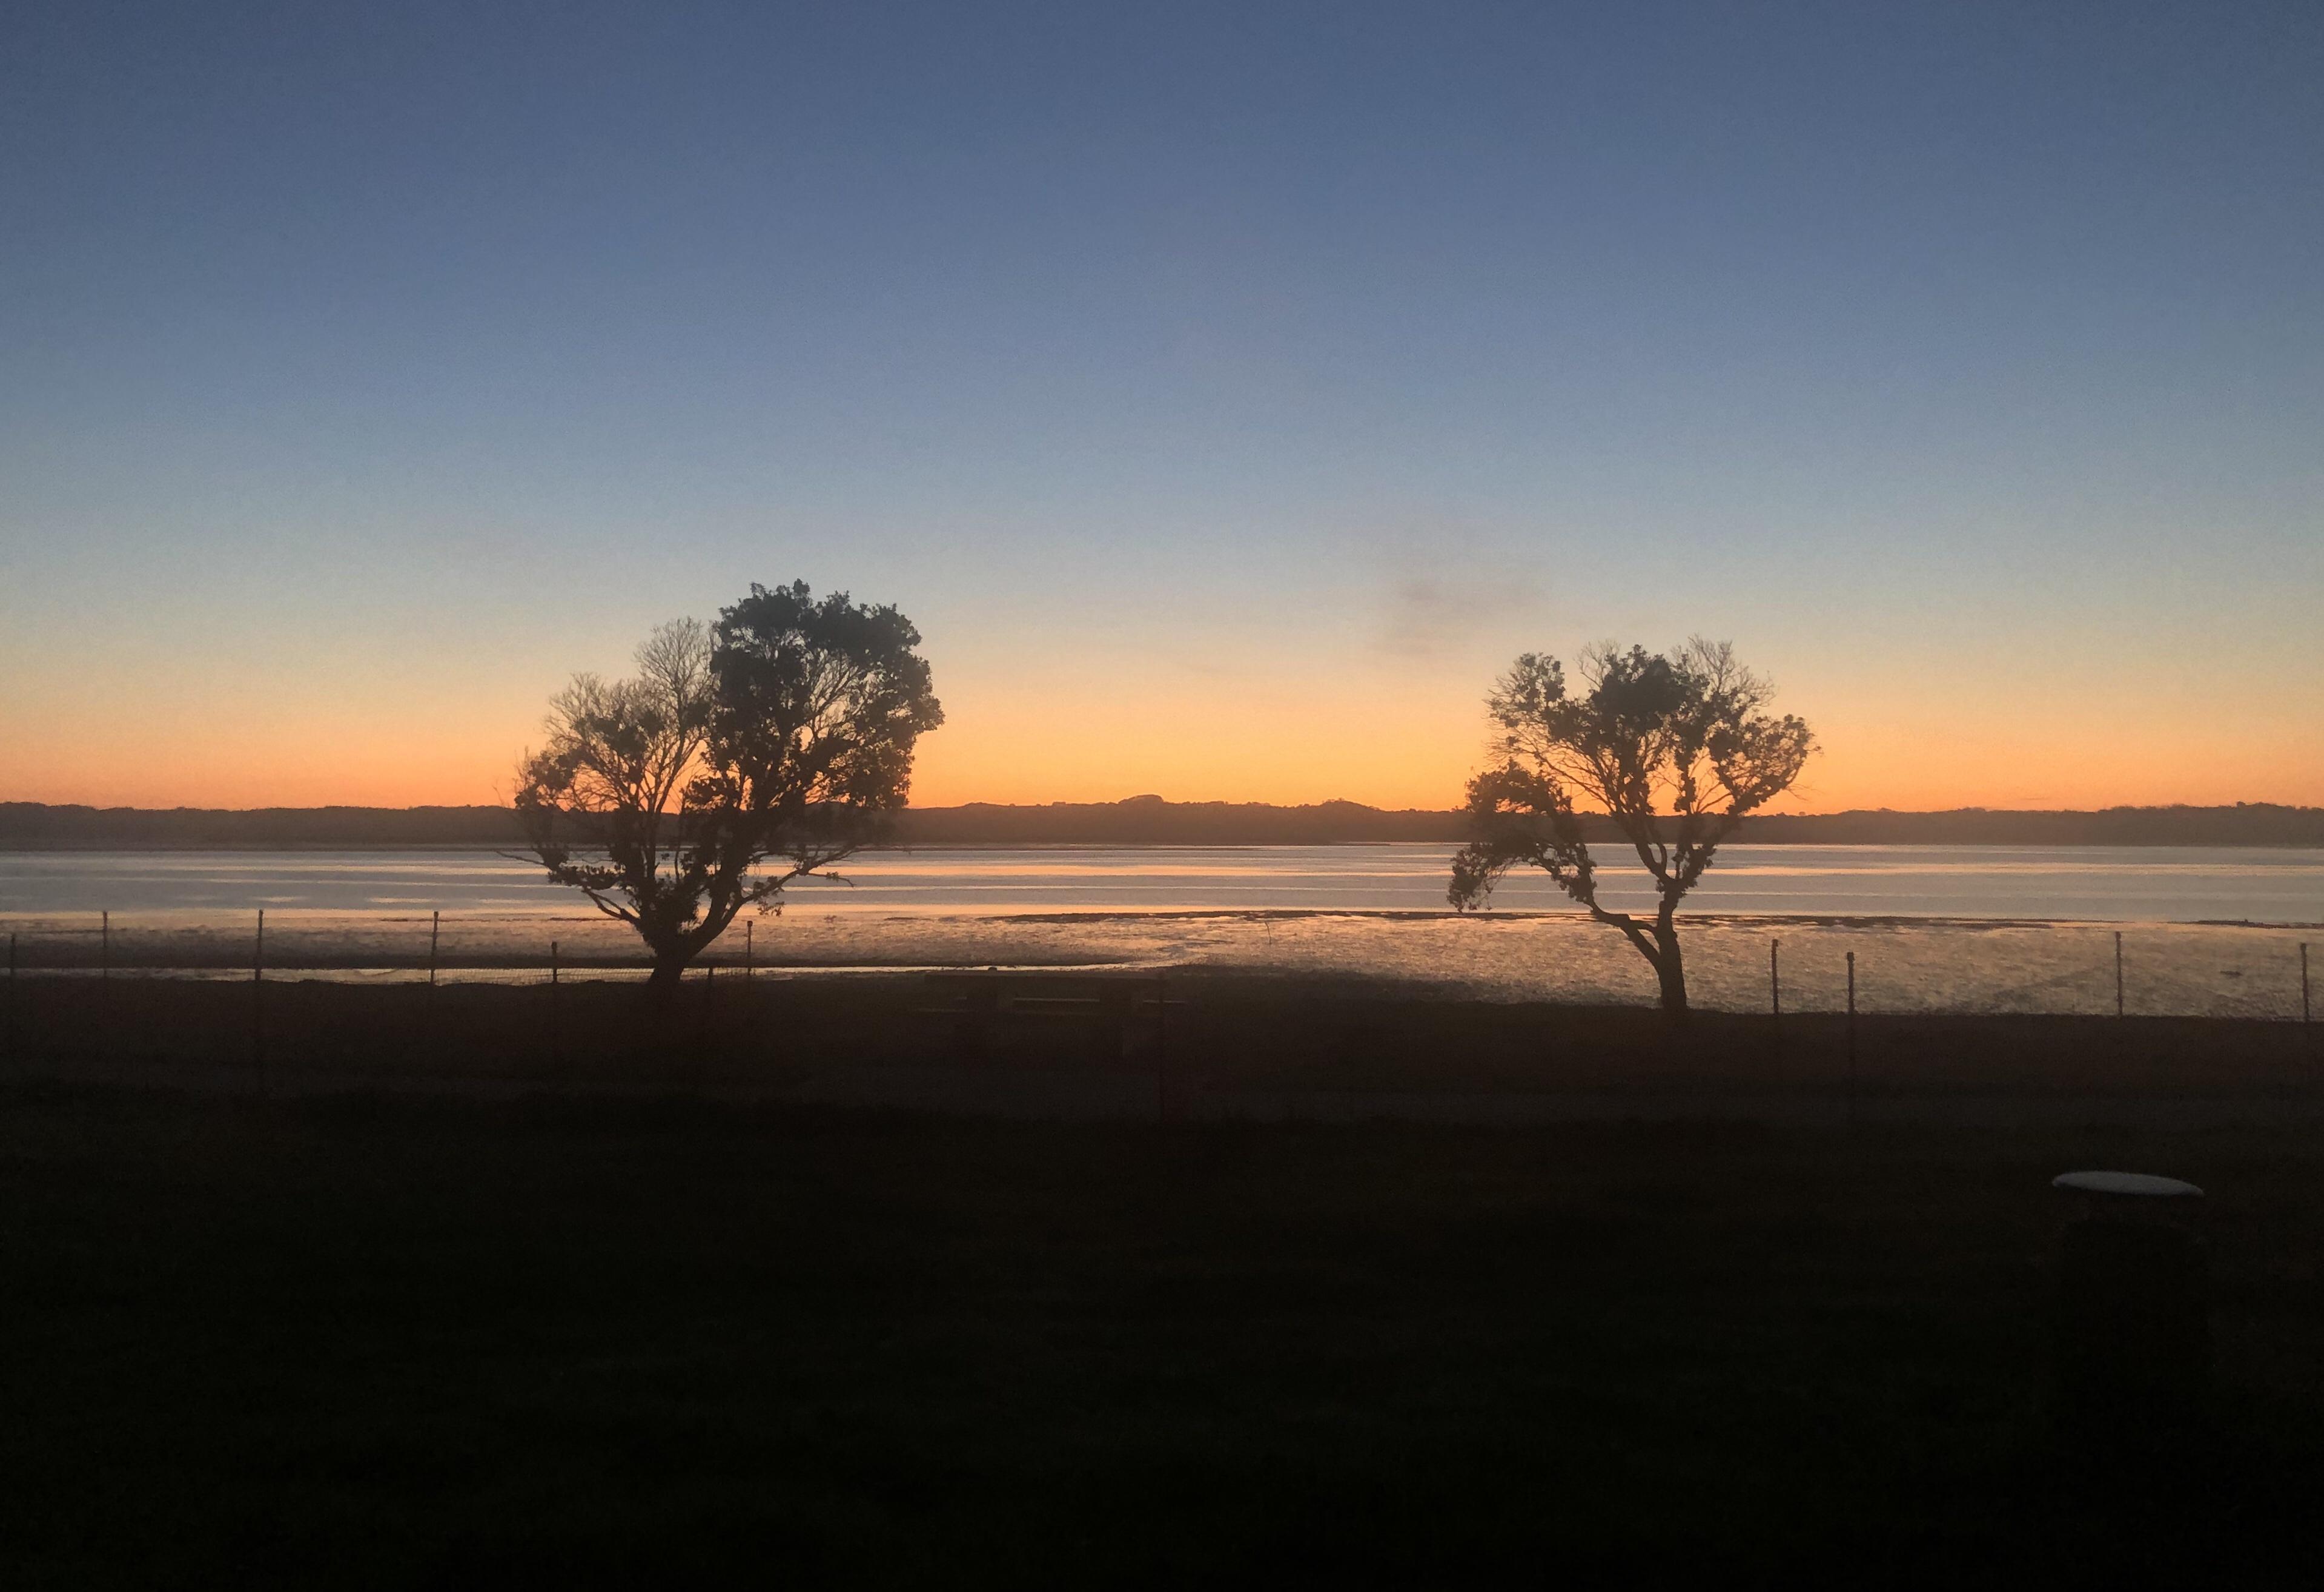 Sunrise around 6.34 am